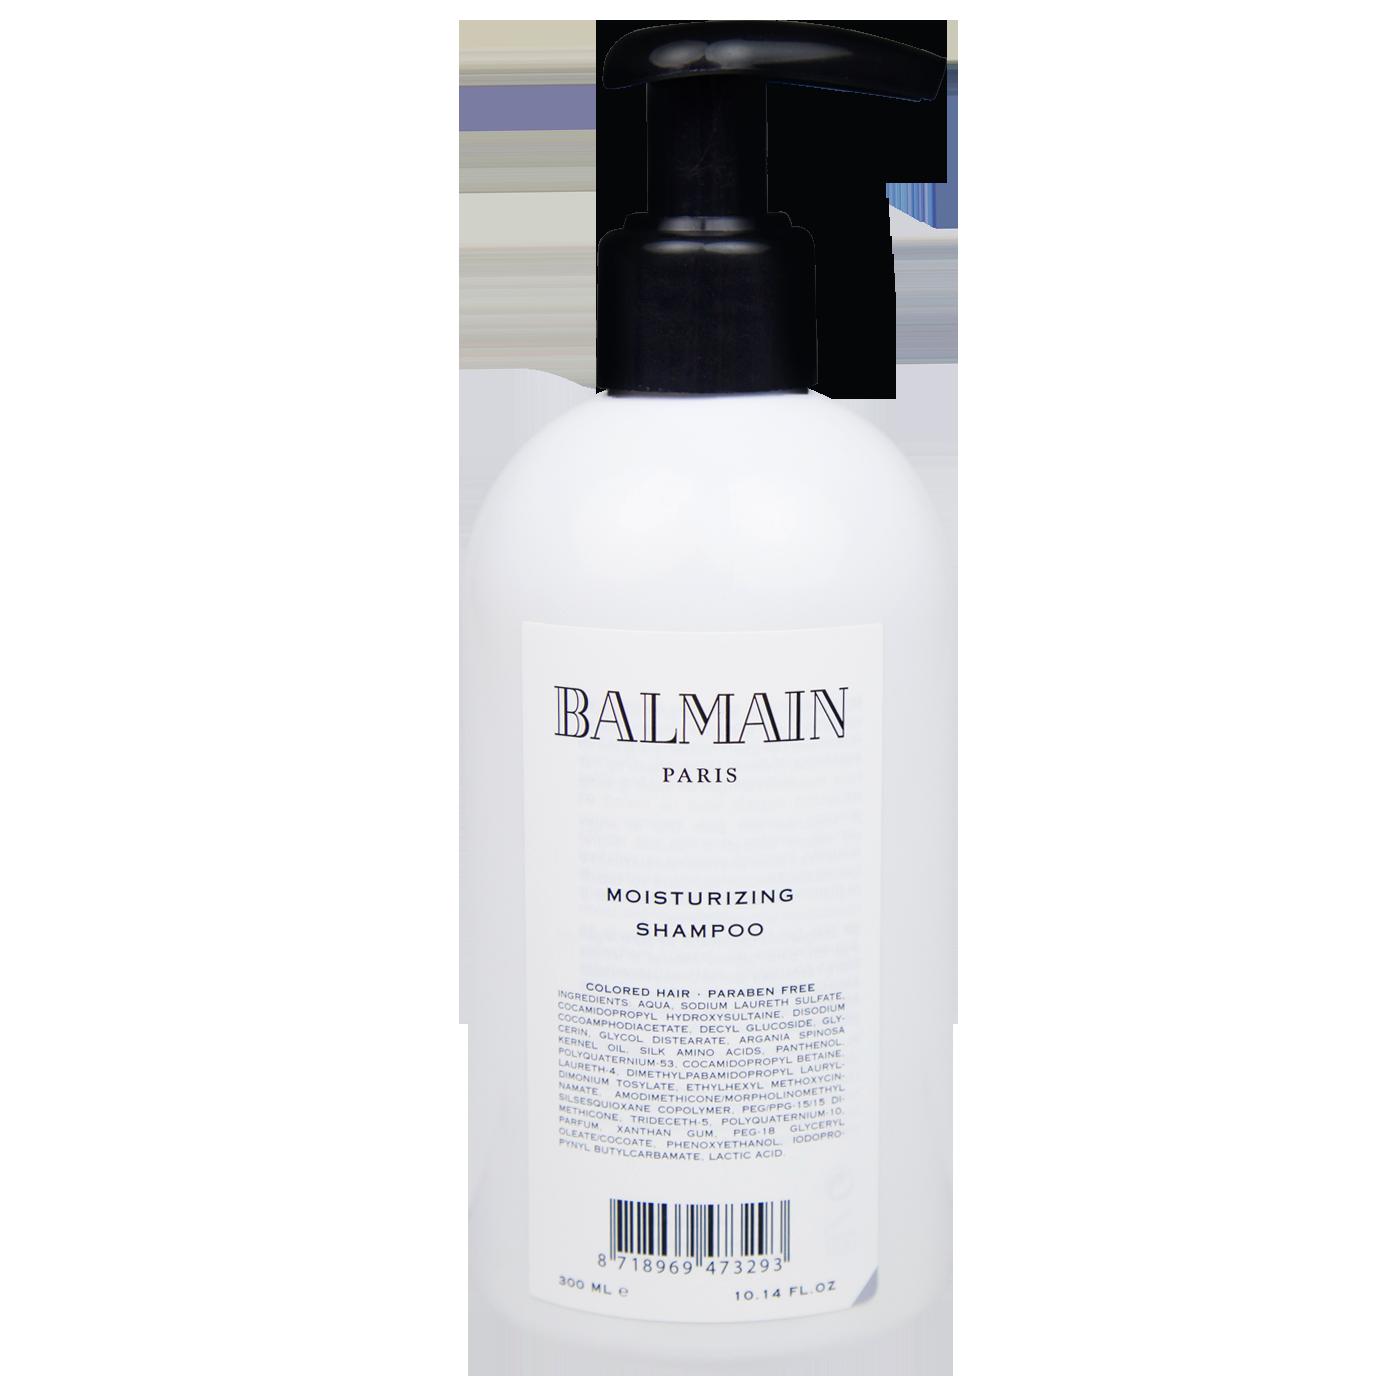 Balmain Moisturizing Shampoo 300 ml | Shampoo Hidratante